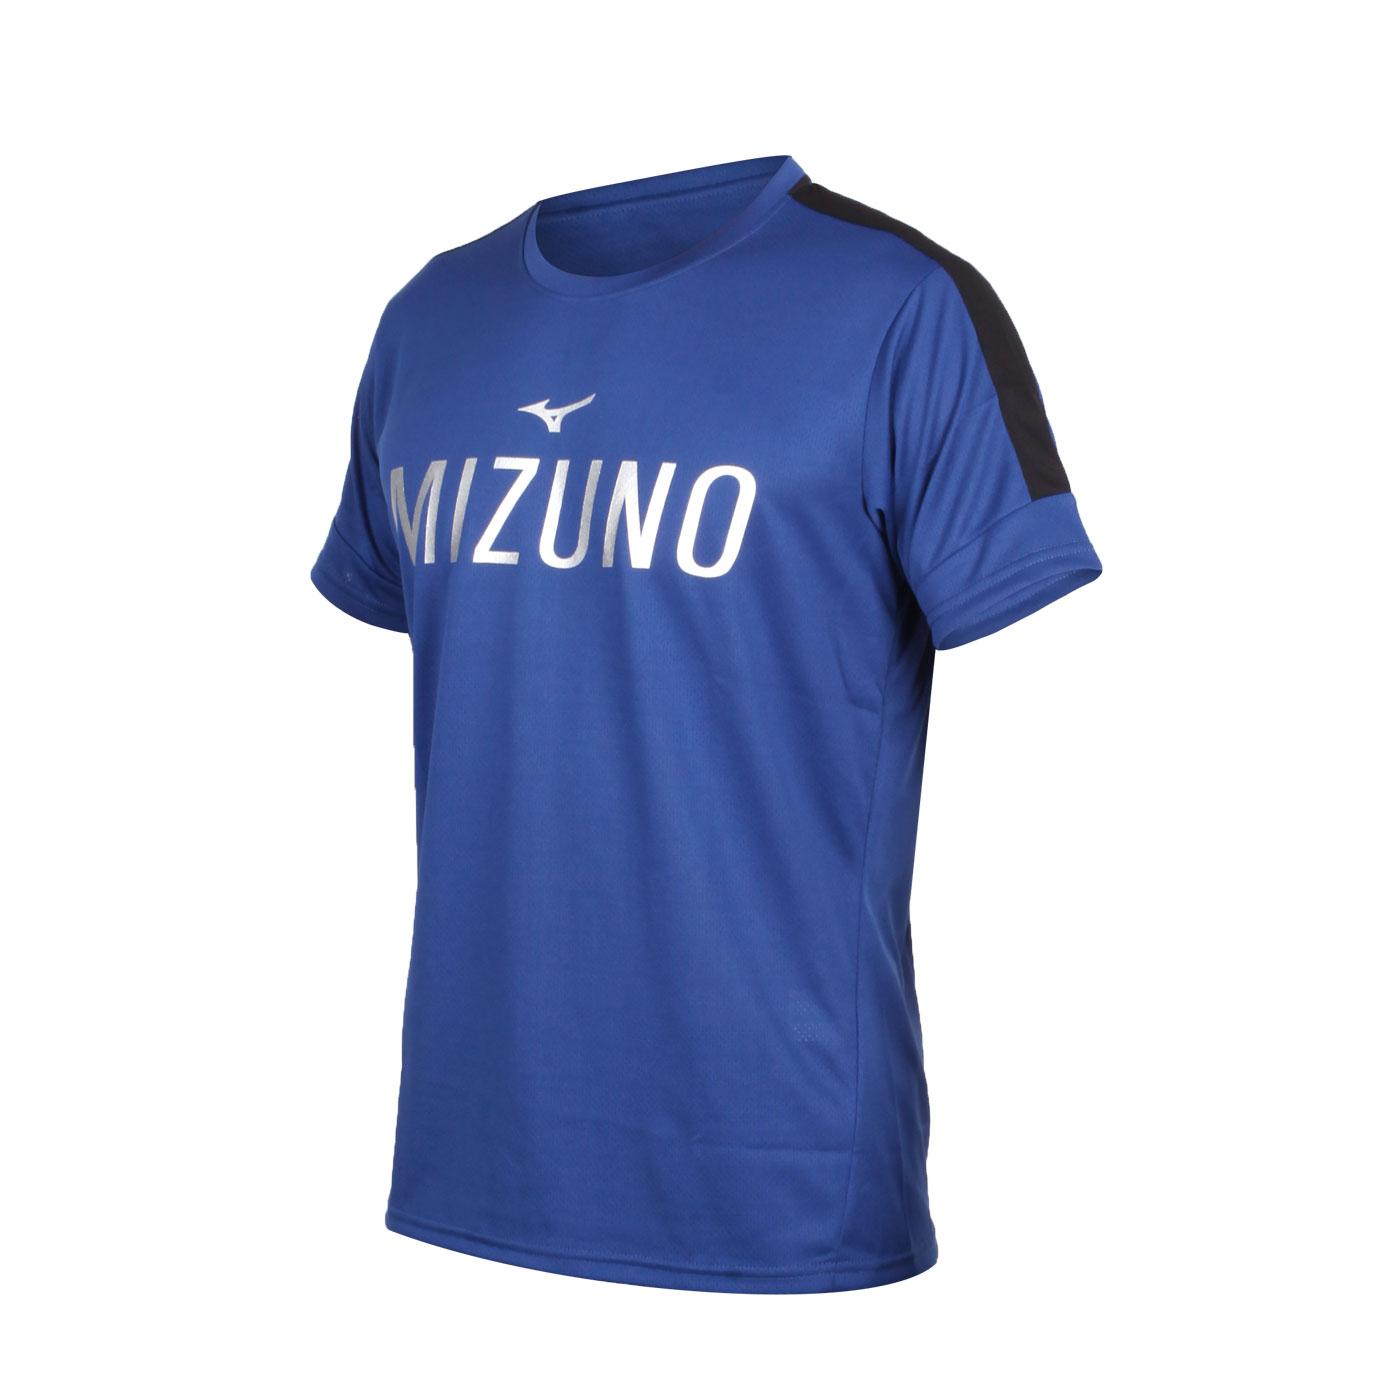 MIZUNO 男款短袖T恤 K2TA050201 - 丈青黑銀